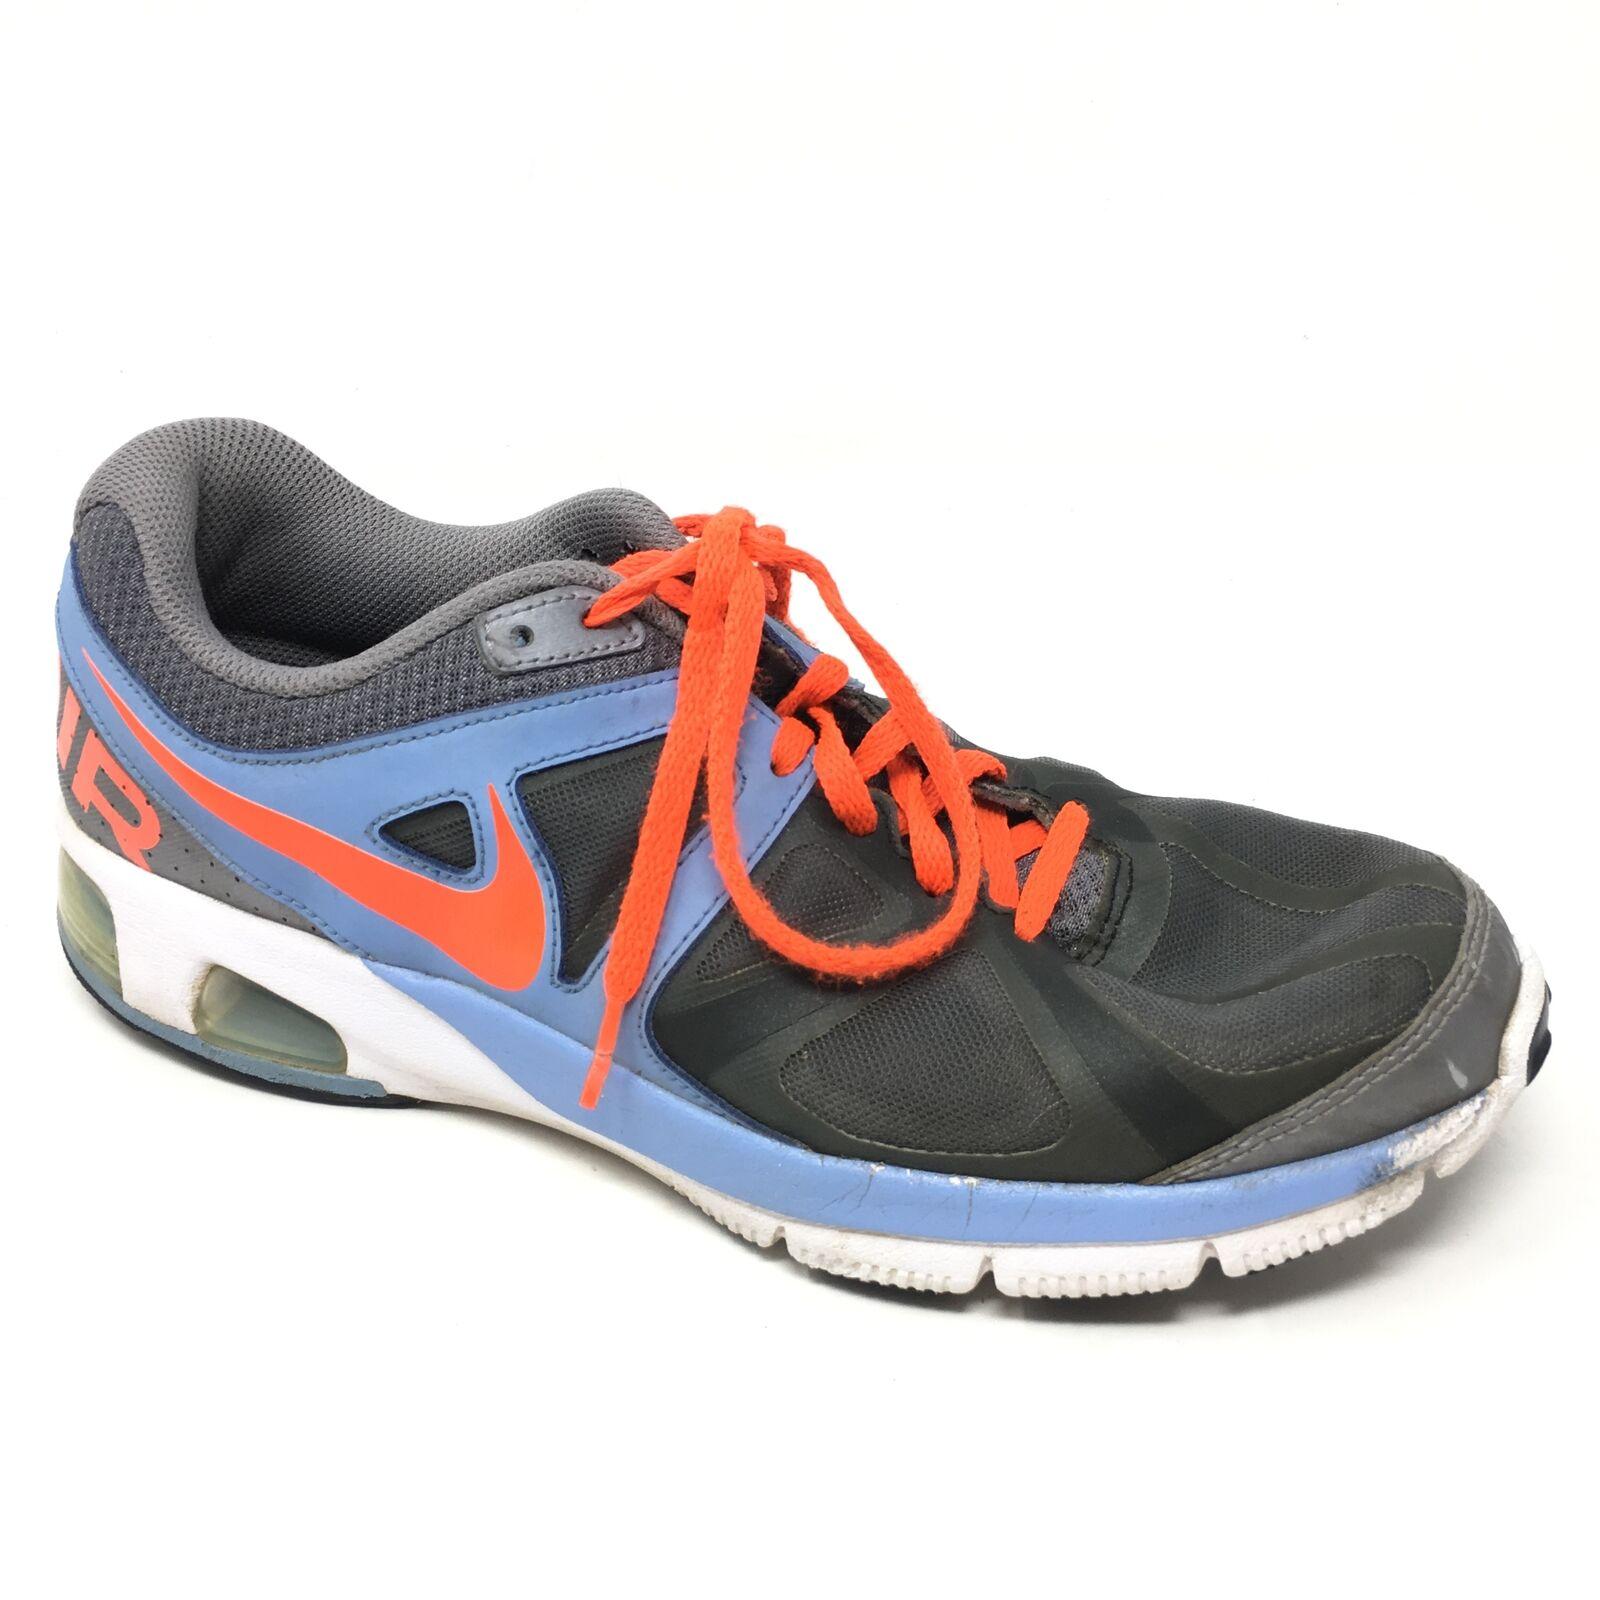 Women's Nike Max Run Lite 4 Shoes Sneakers Comfortable Brand discount